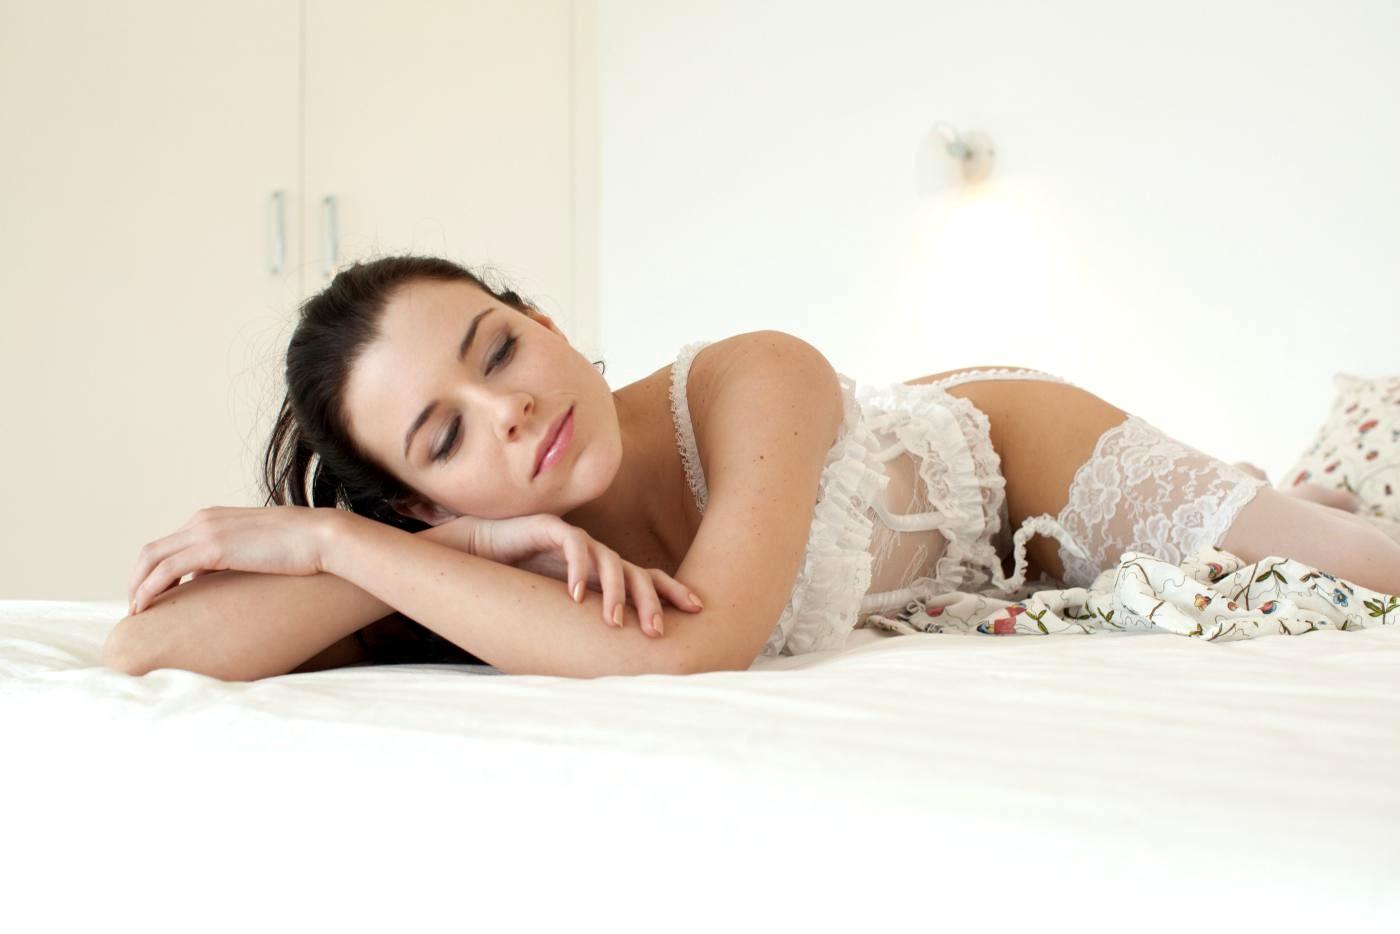 Jill nicolini playboy nude